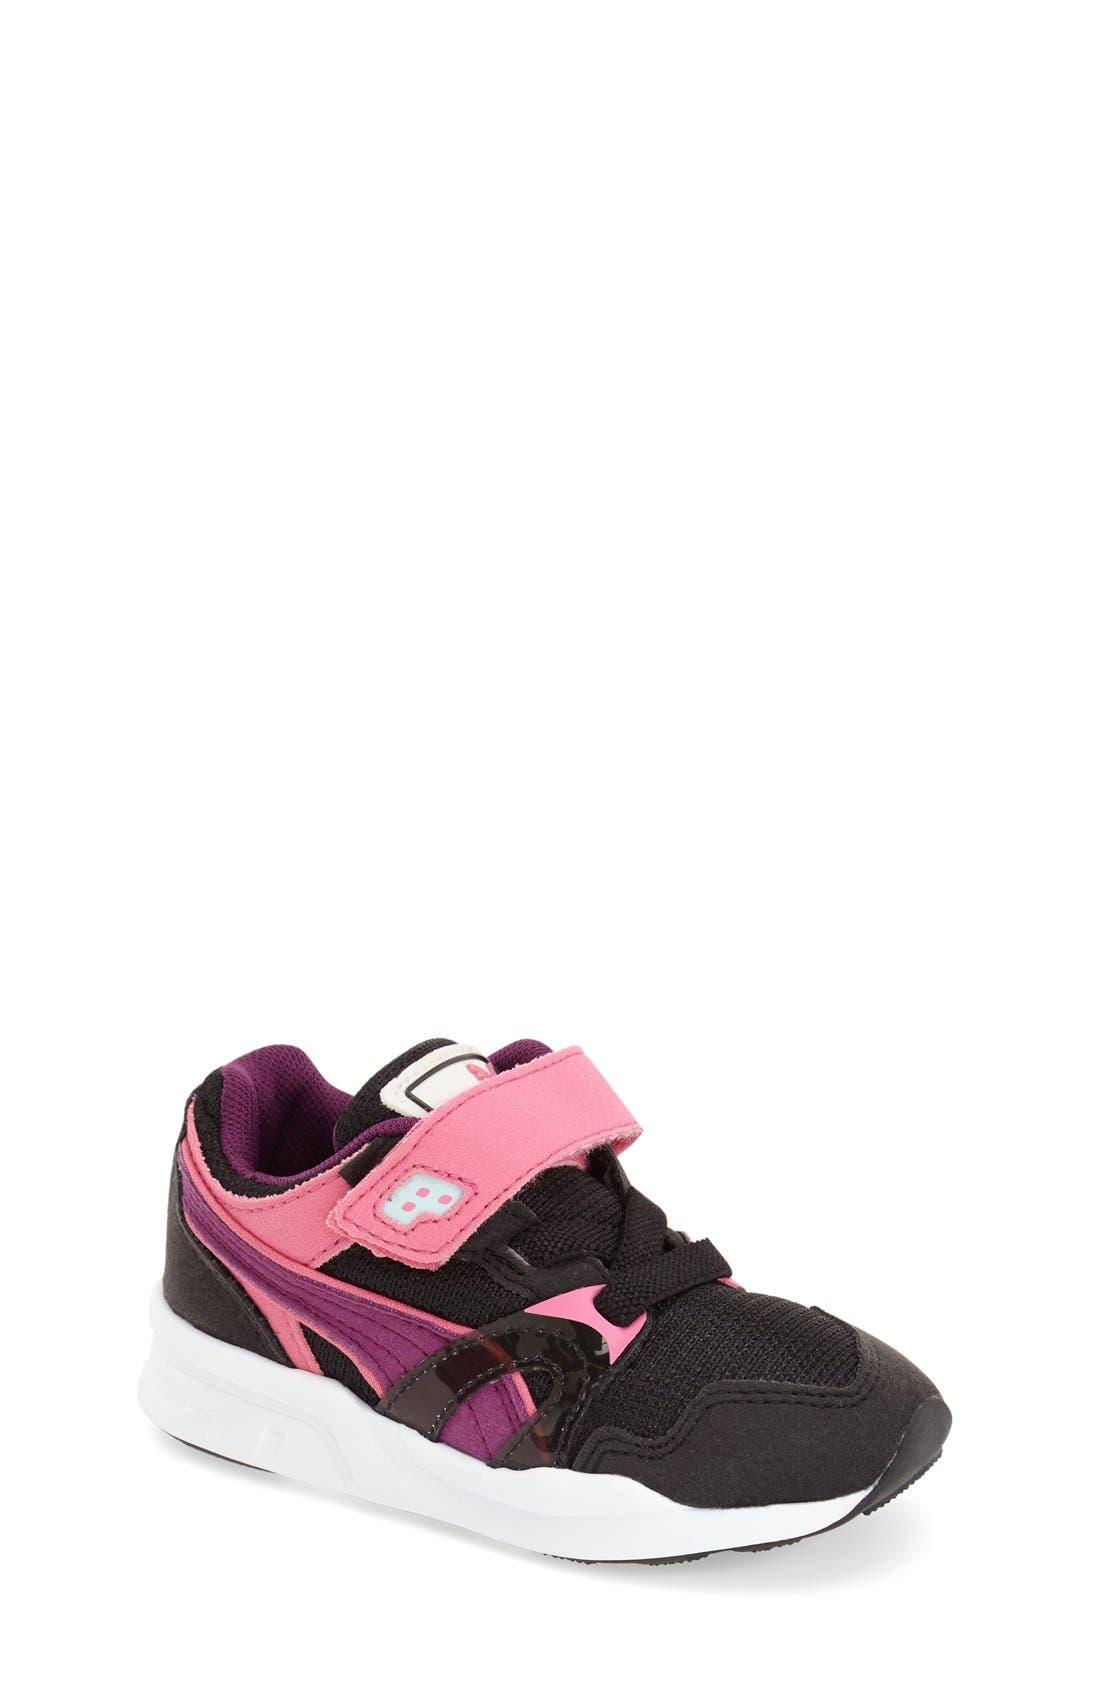 Main Image - PUMA 'Trinomic XT1 Plus V' Sneaker (Baby, Walker, Toddler, Little Kid & Big Kid)